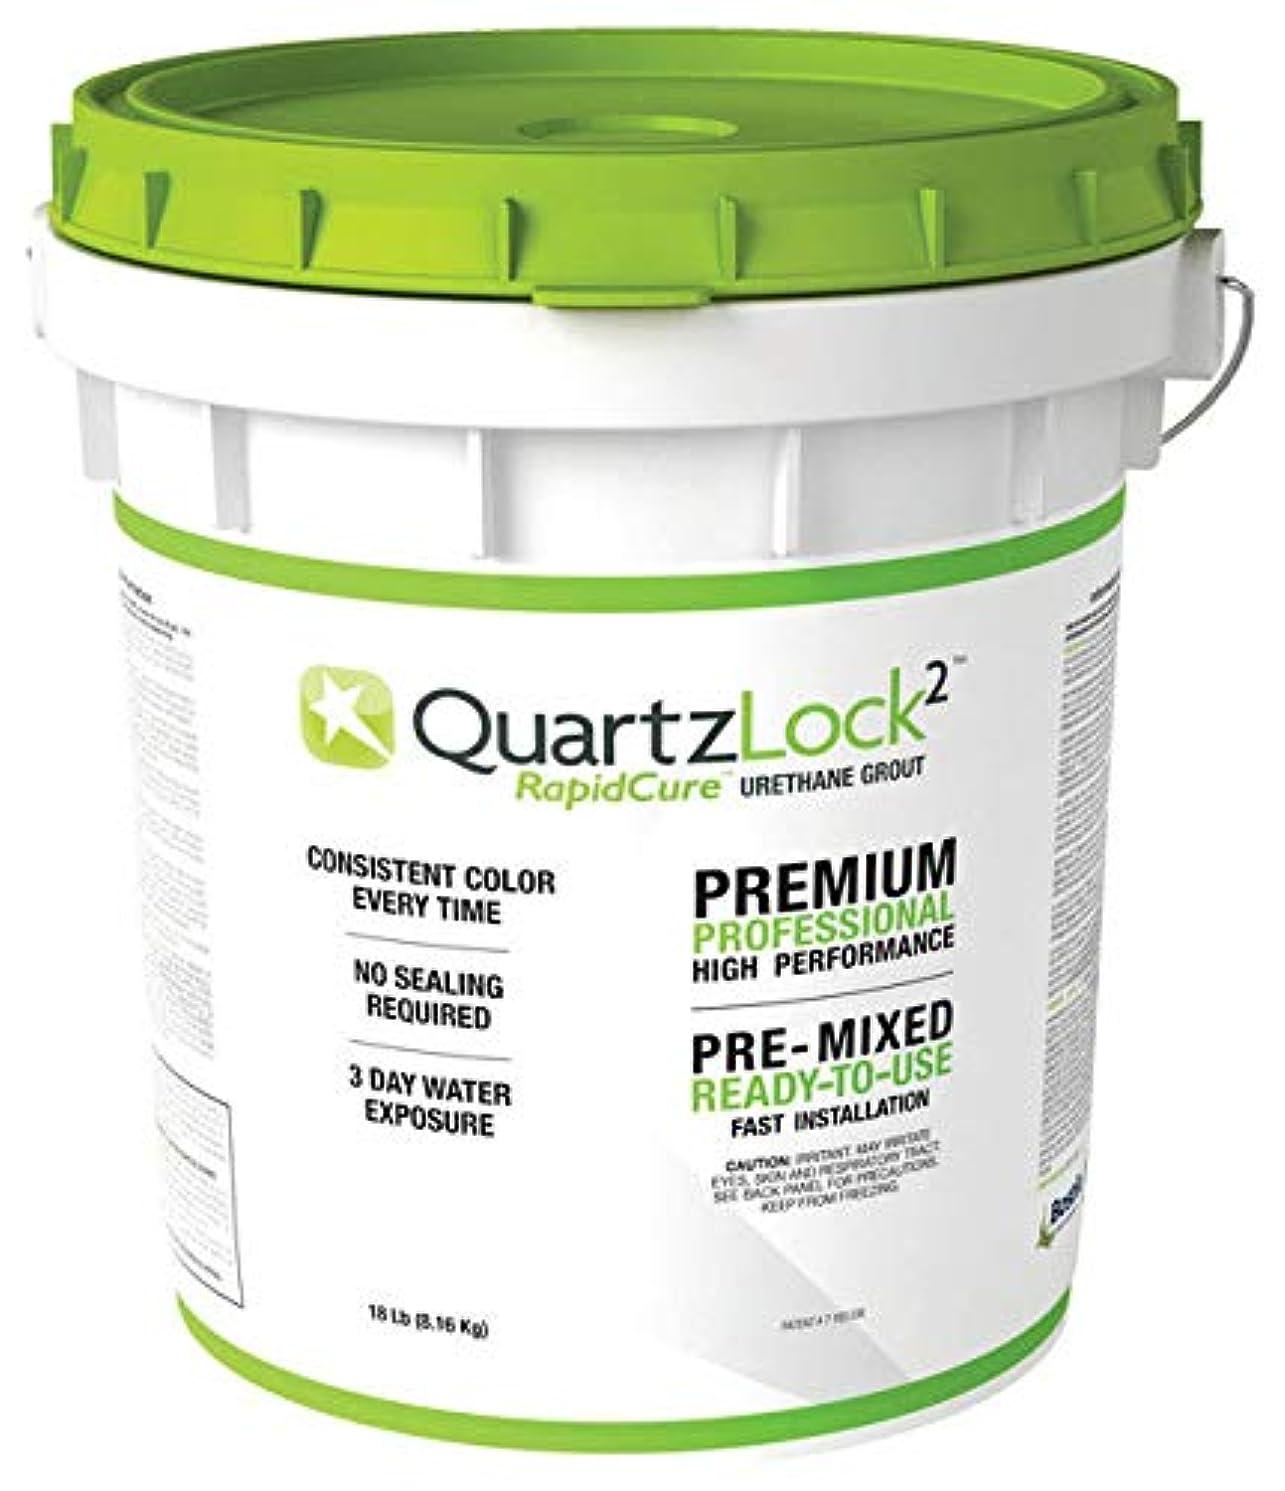 Bostik Quartzlock2 Urethane Based Grout (9lbs, 245 Wheat)